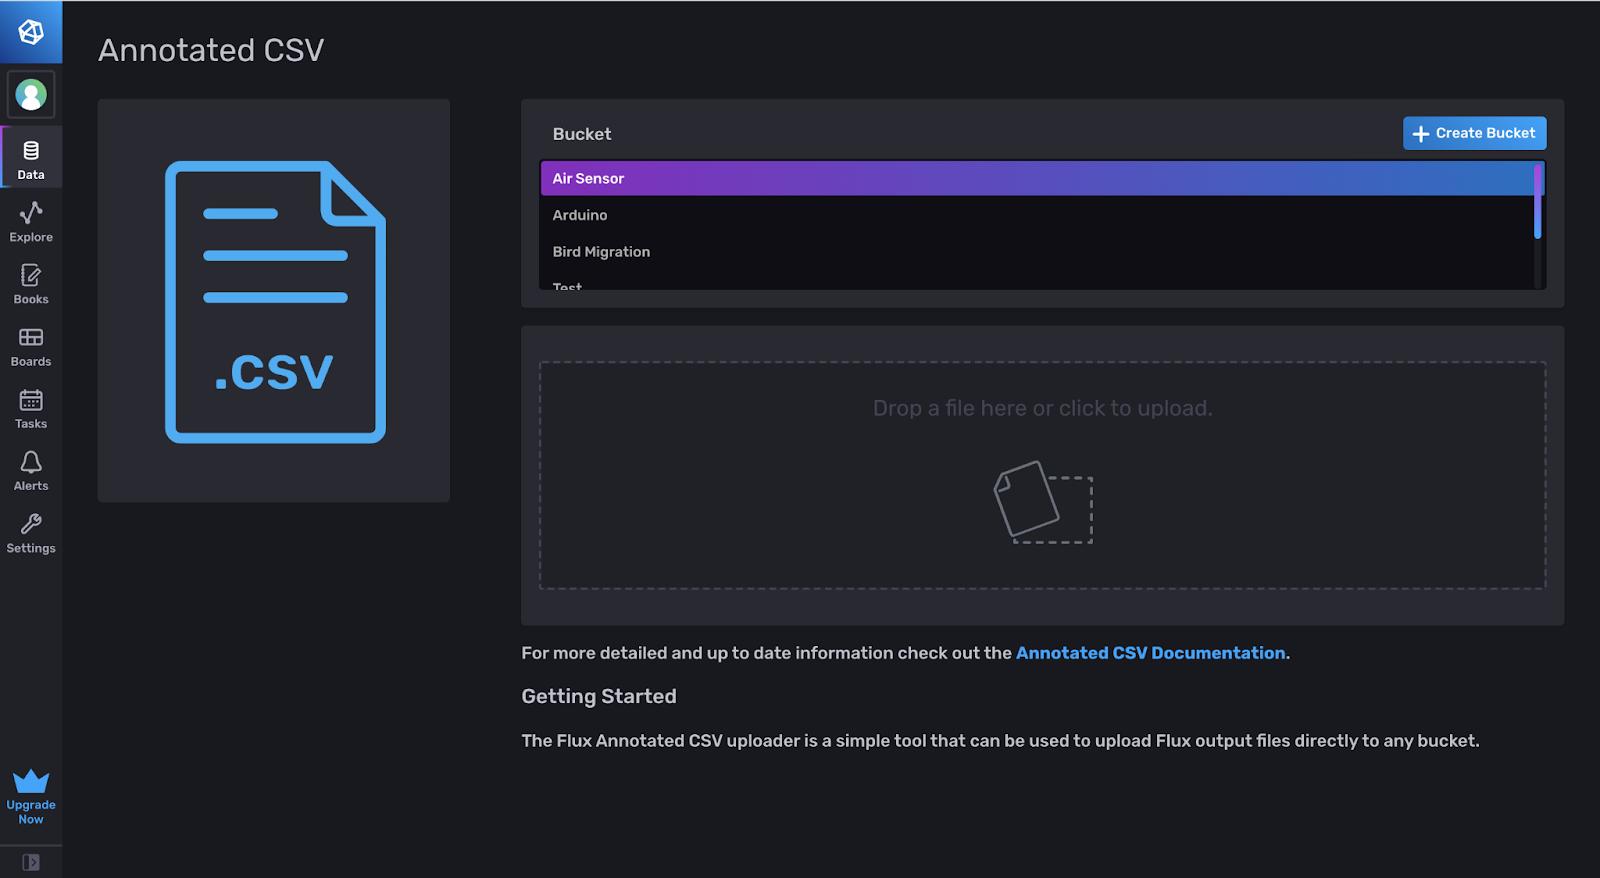 InfluxDB annotated CSV upload data